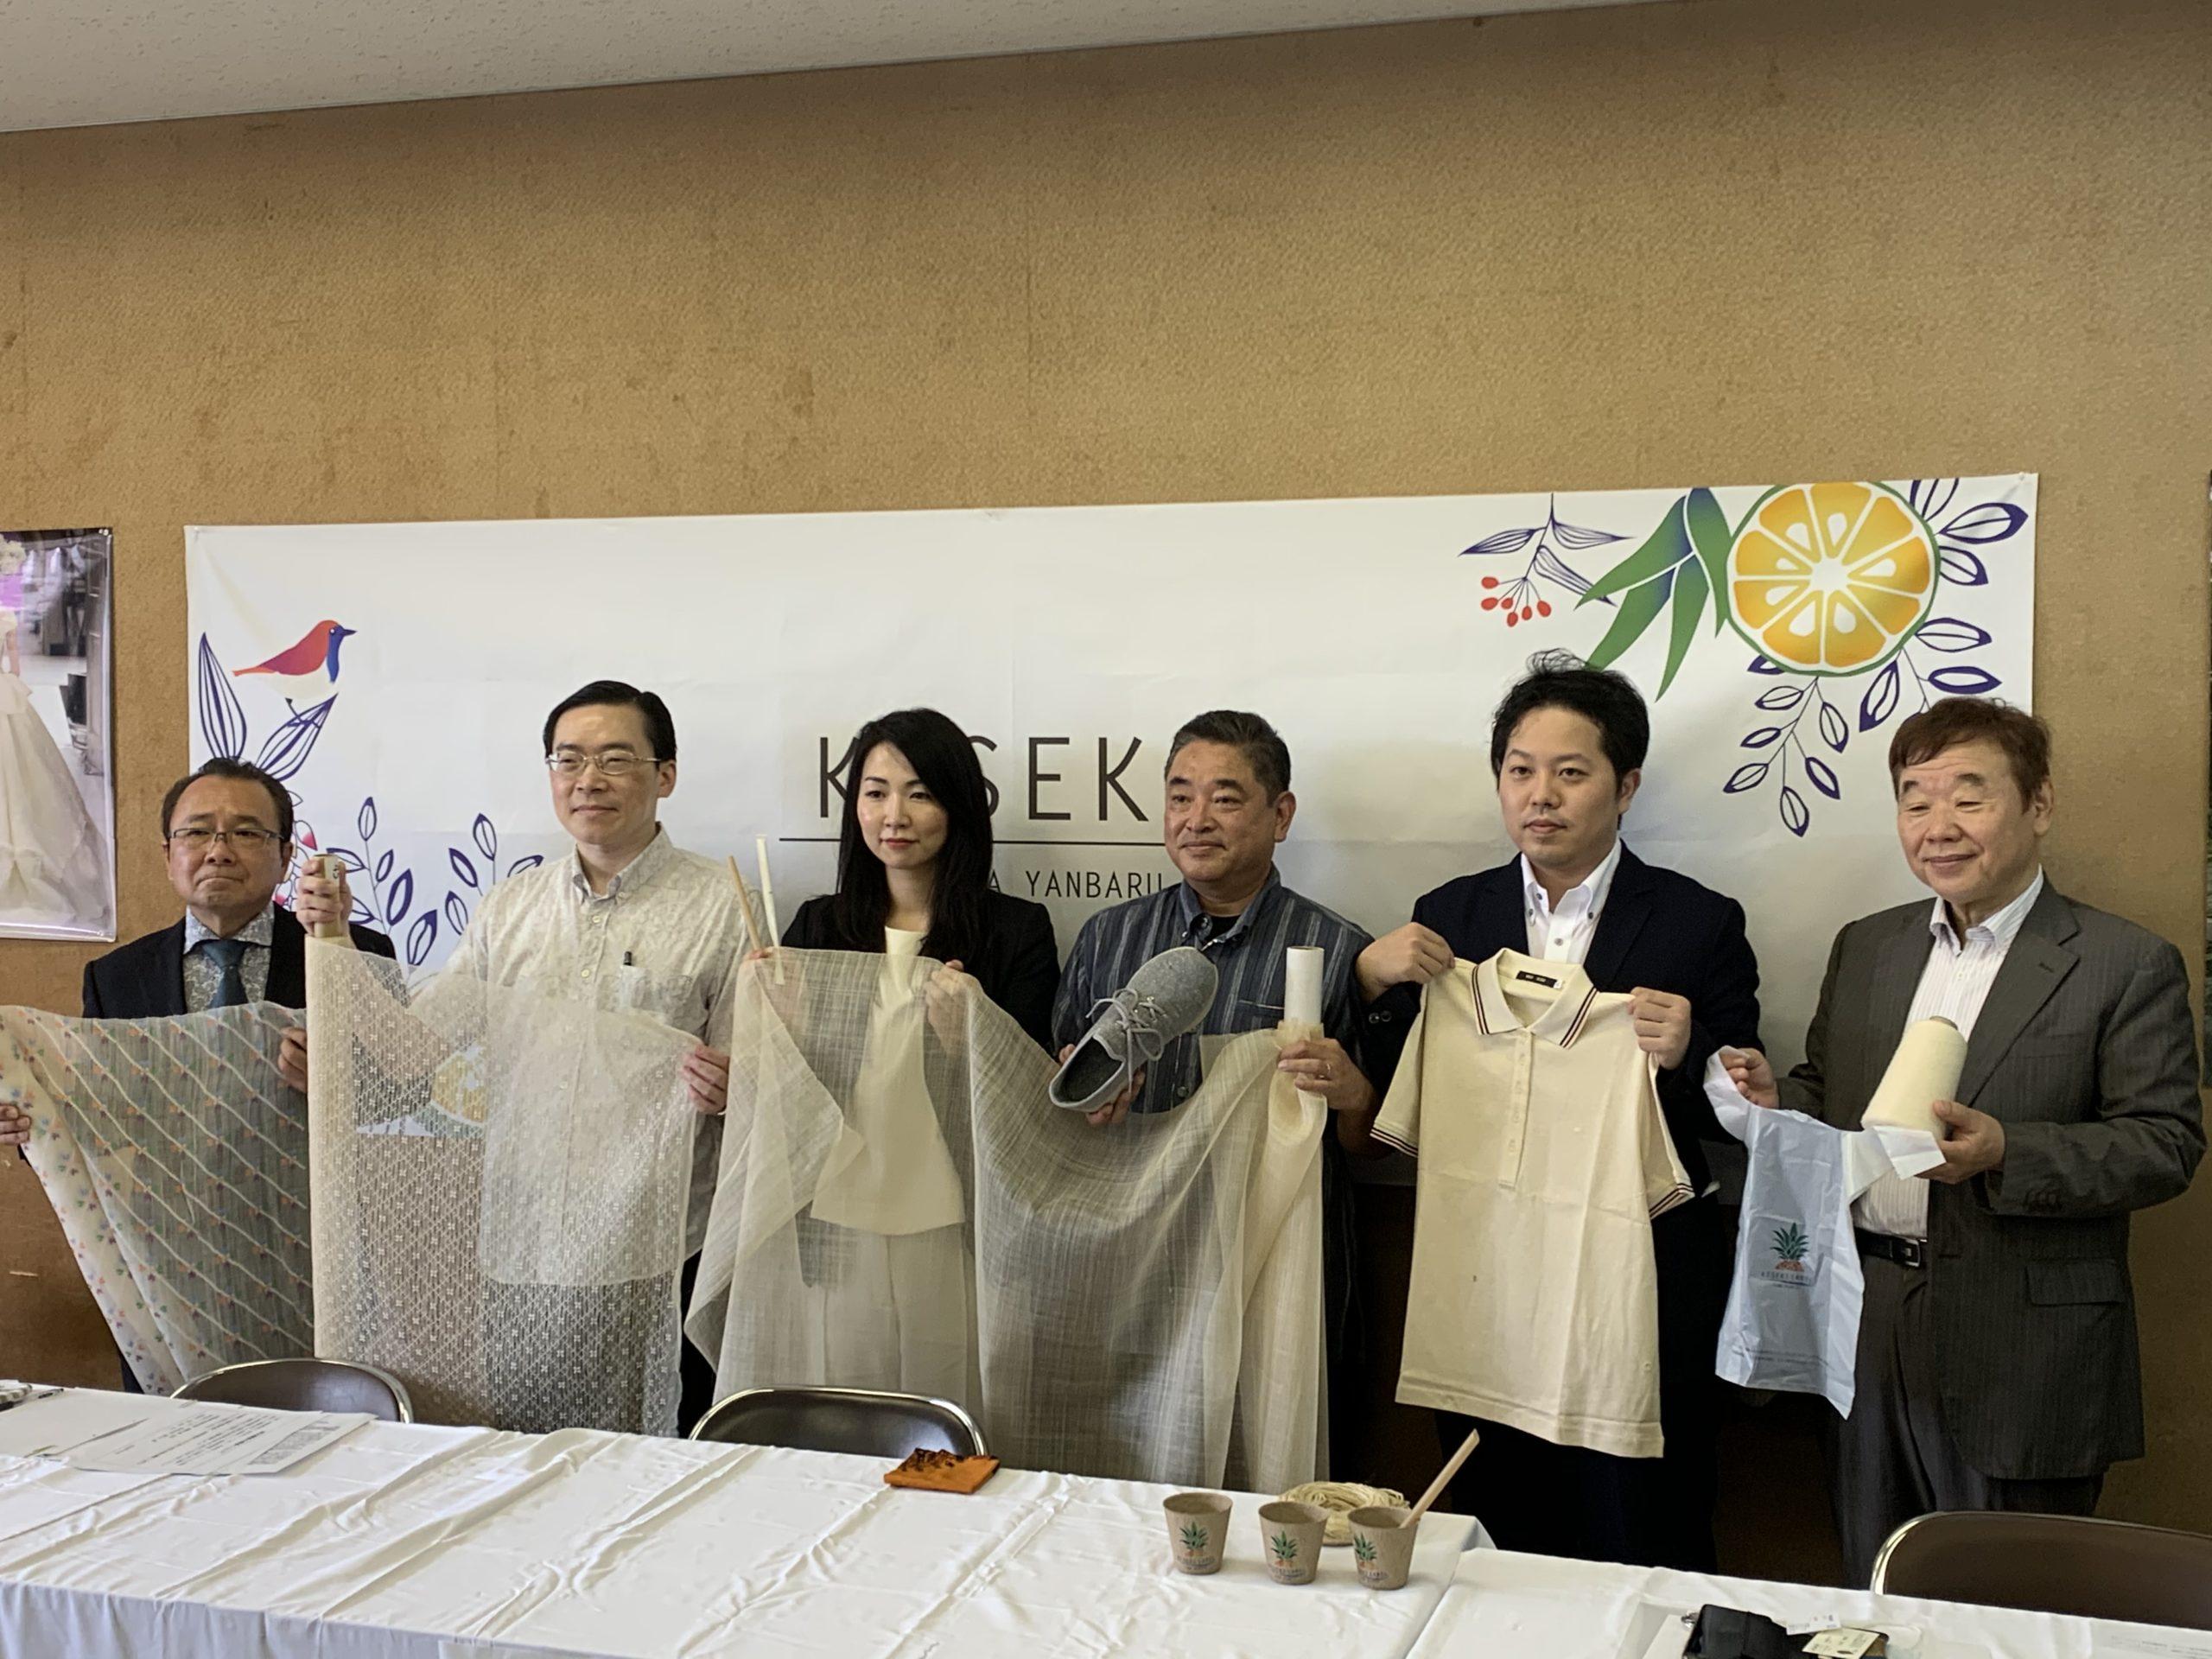 SDGsプロジェクト「KISEKI LABEL」に関する記者会見を行いました